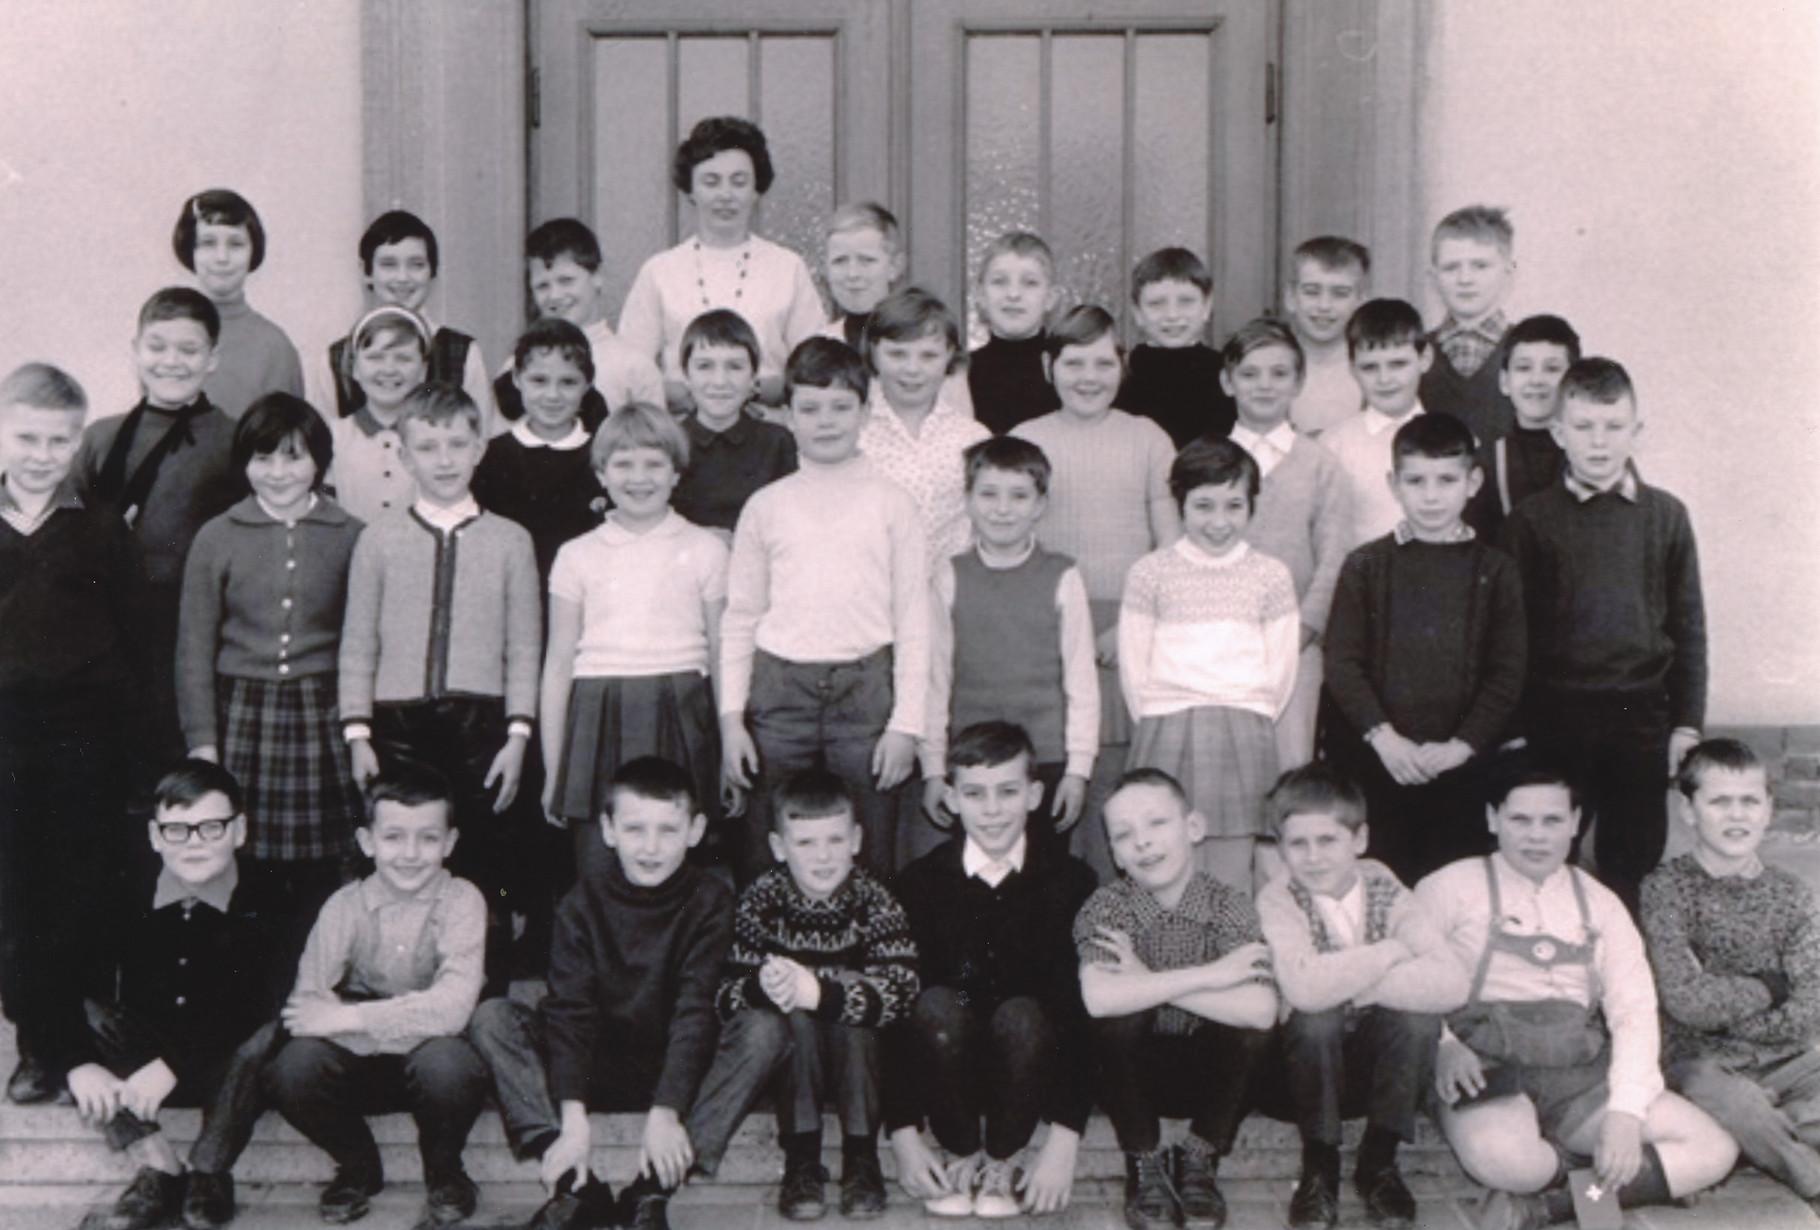 Jahrgang 1958, Bild: Dyhr,Holger